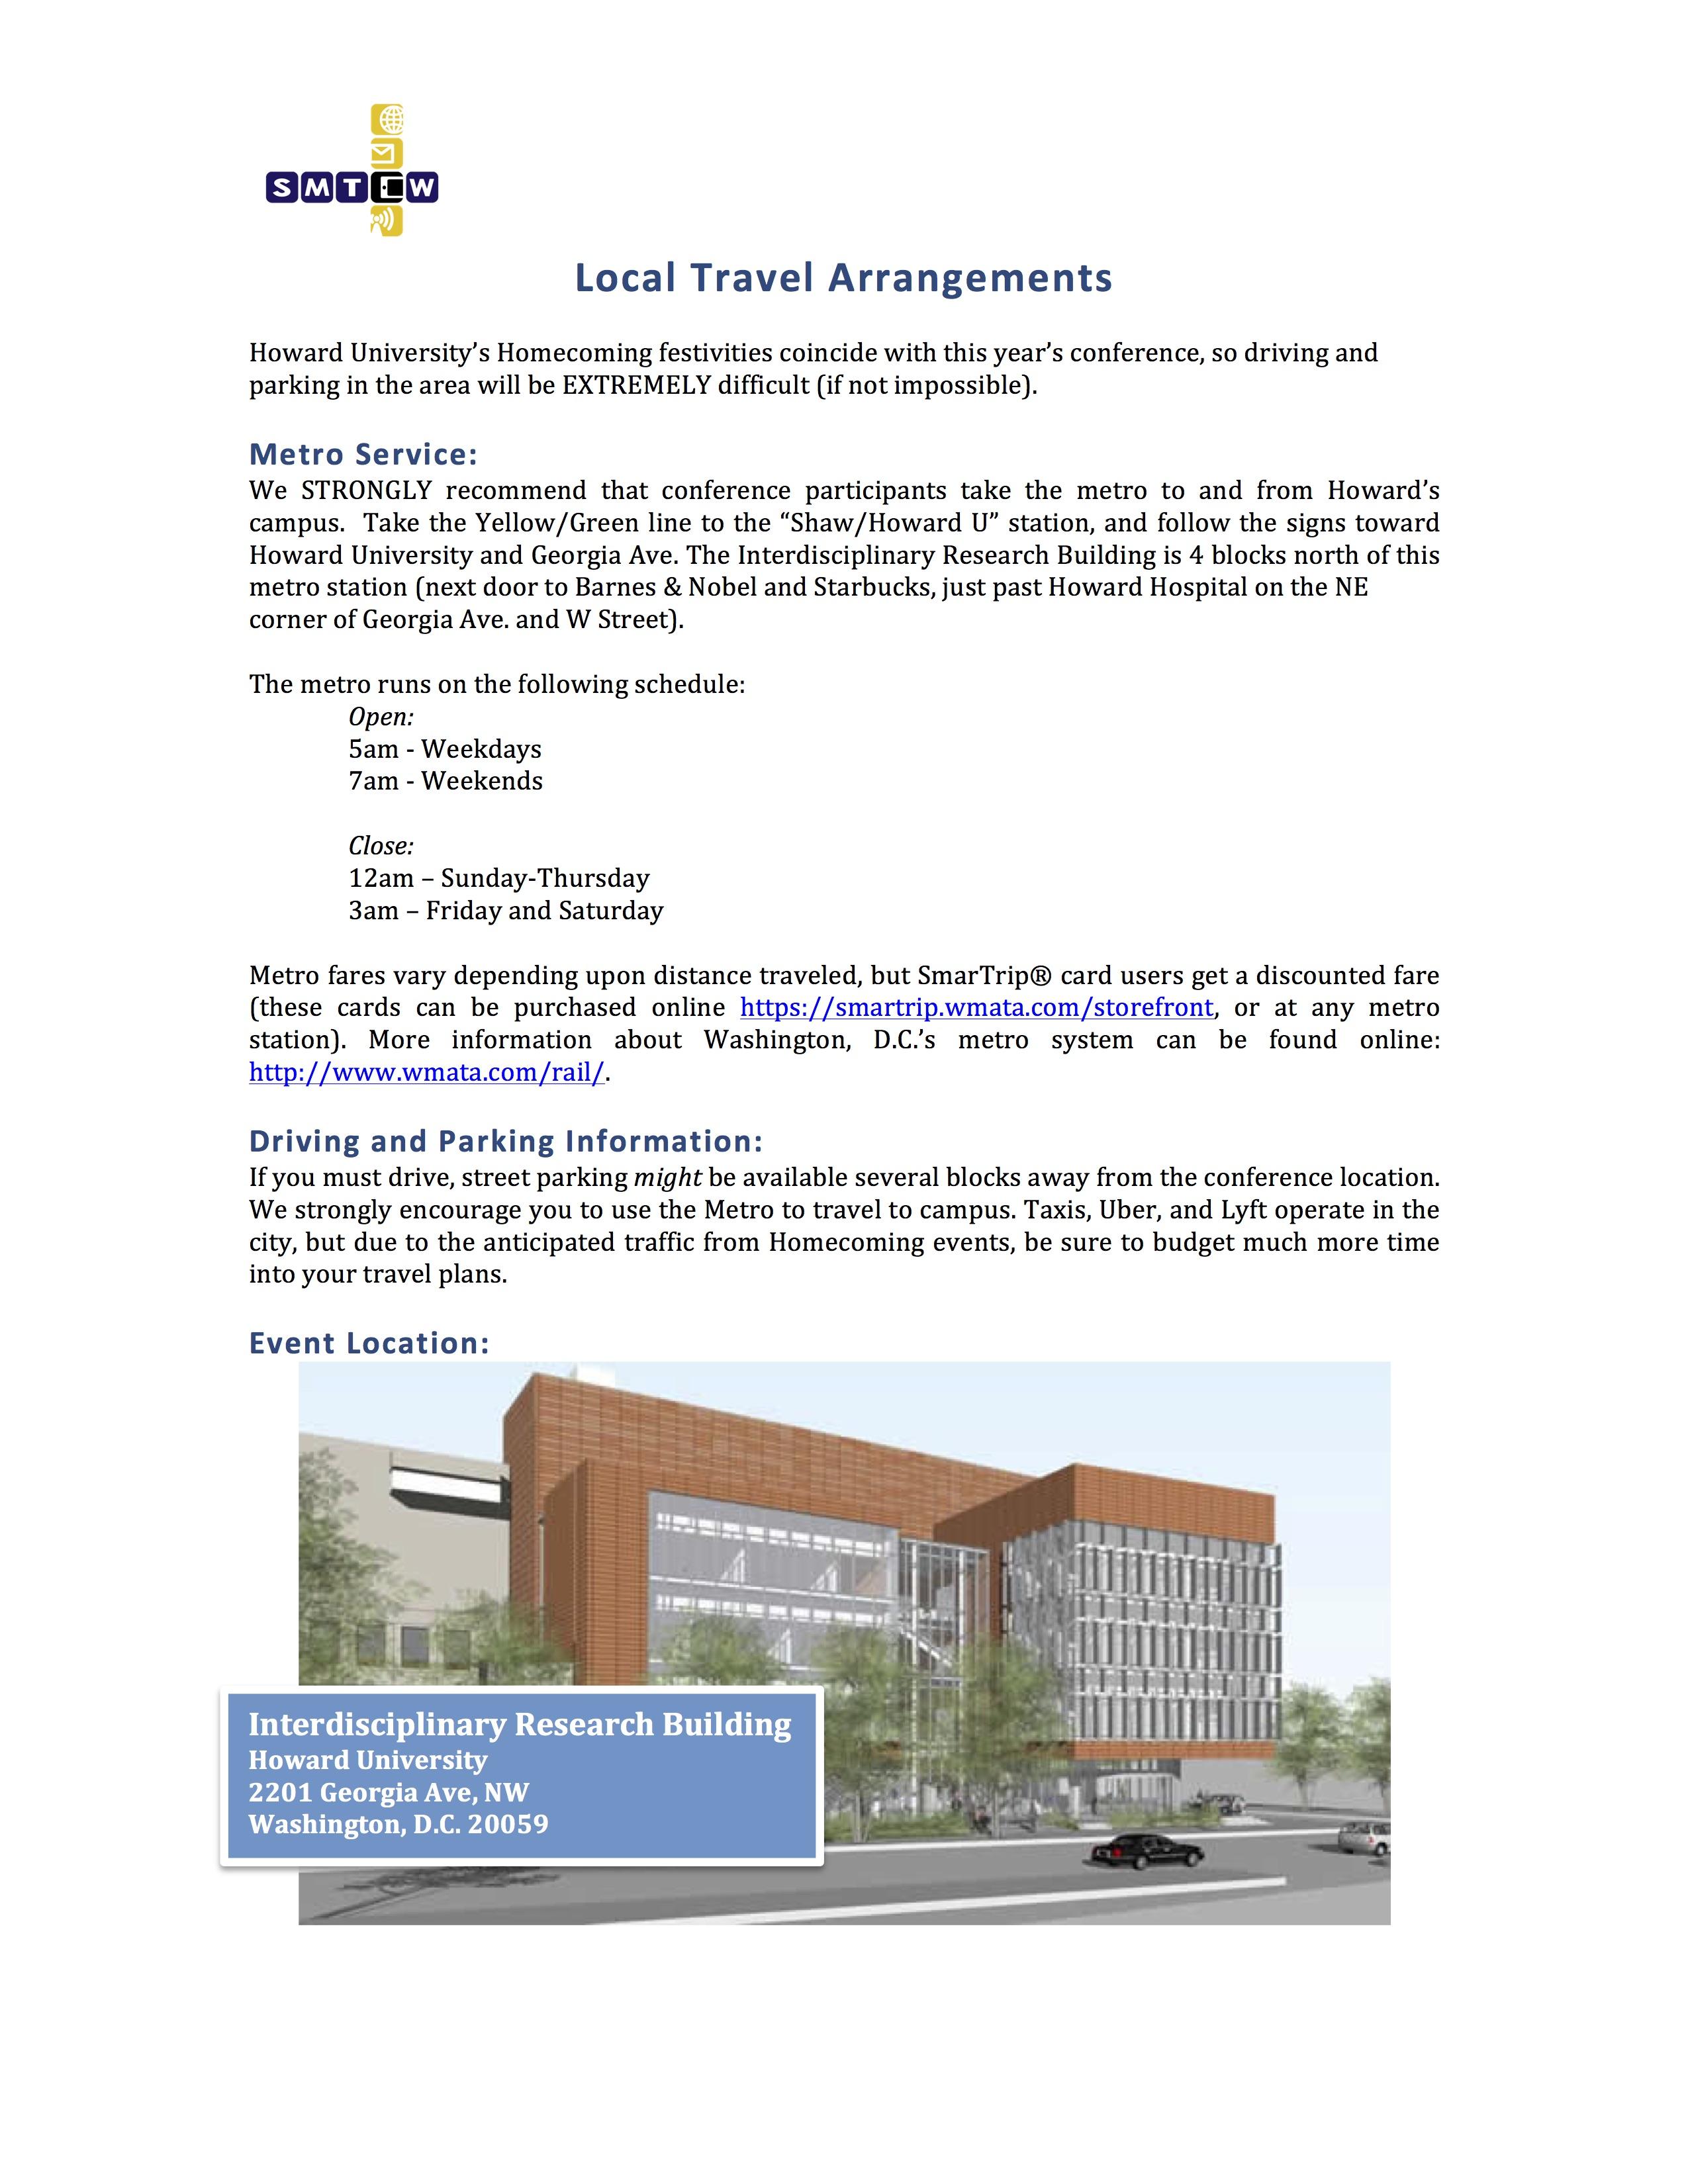 SMTC Travel